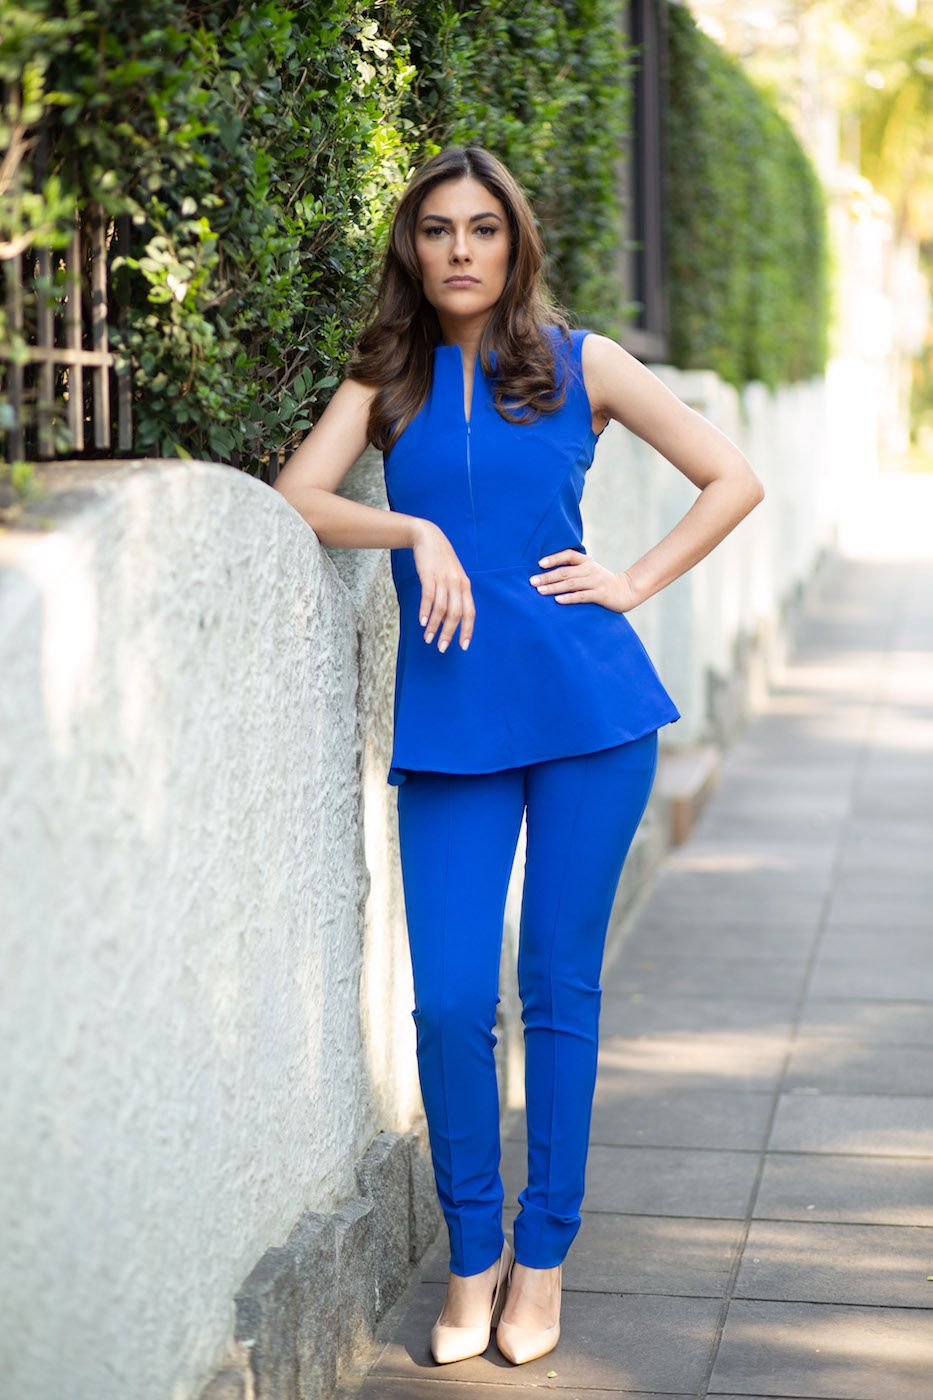 Blusa Babado Peplum Alfaiataria Feminina Azul bic